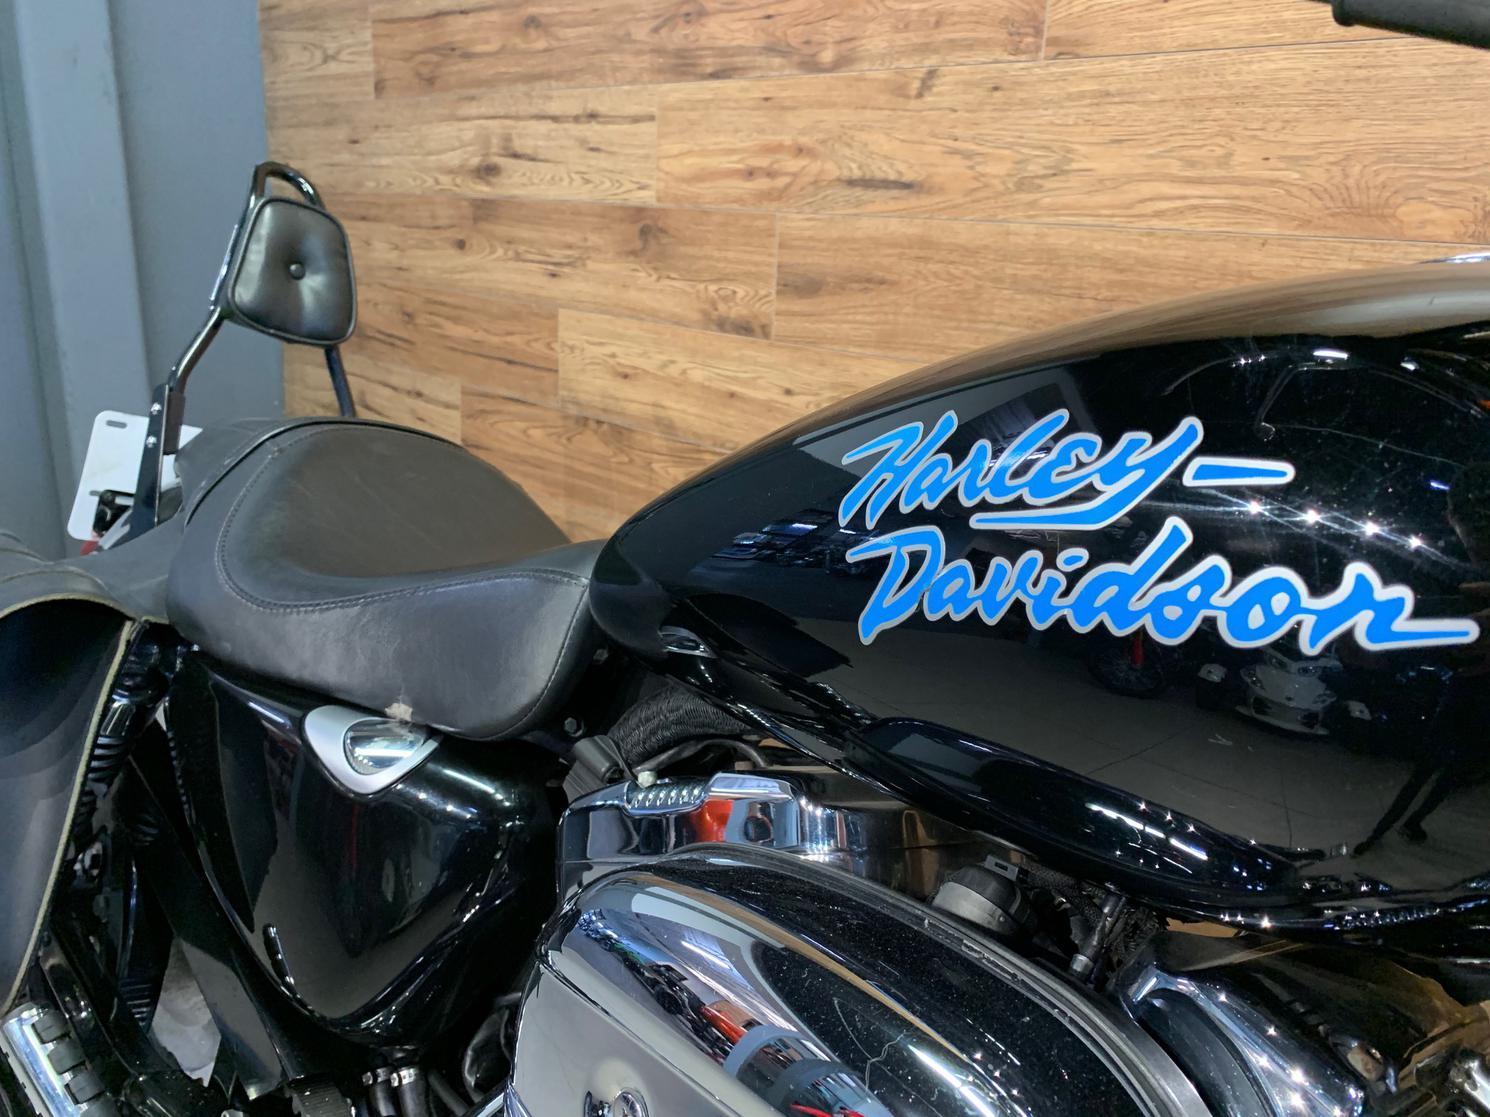 Pre Owned 2007 Harley Davidson Sportster 1200 Custom Xl1200c In Mirabel Motoplex Mirabel